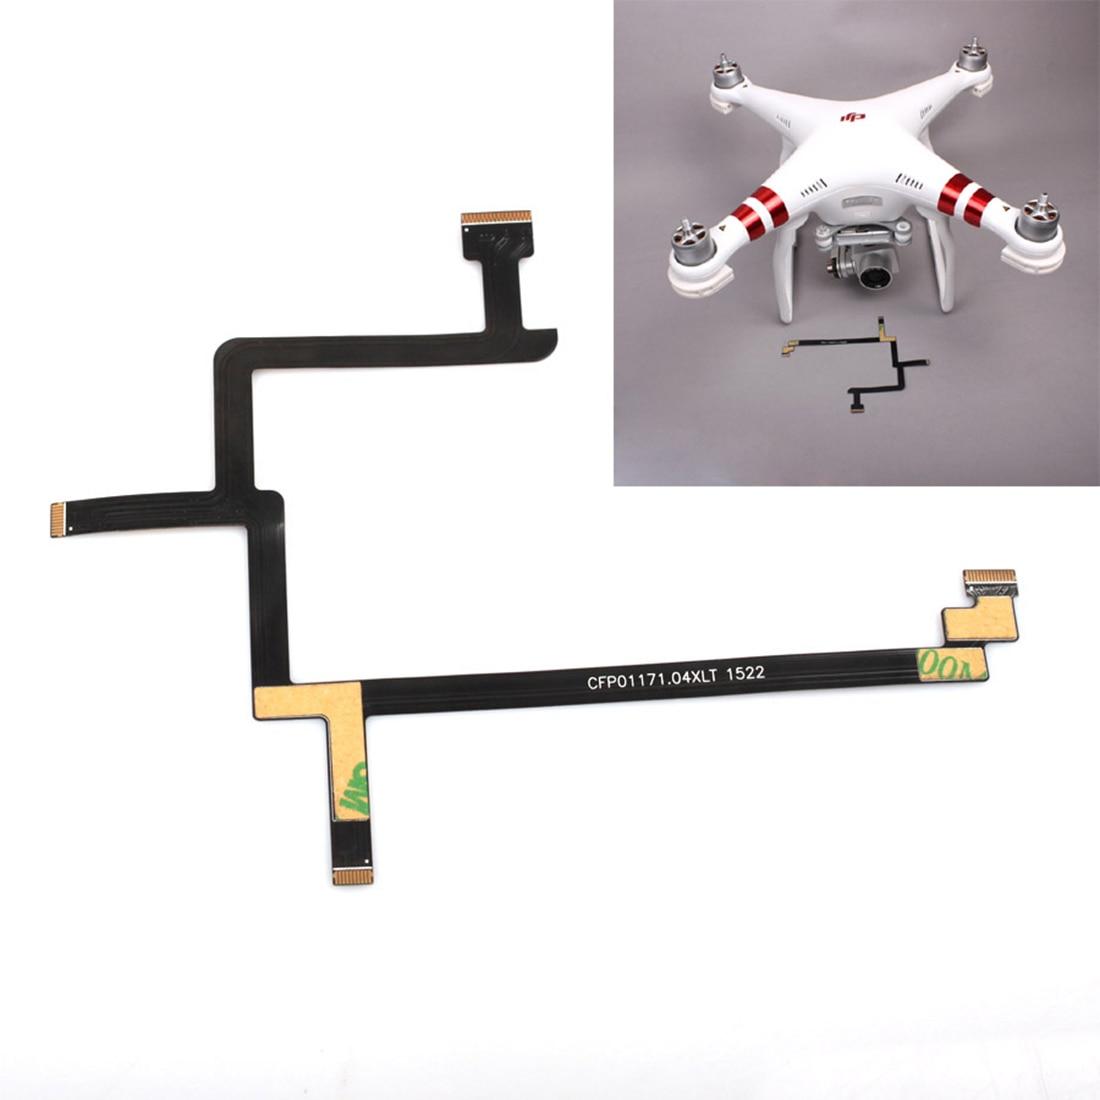 gimbal-camera-flex-ribbon-cable-parts-for-font-b-dji-b-font-font-b-phantom-b-font-3-standard-diy-drone-flight-uav-parts-for-font-b-phantom-b-font